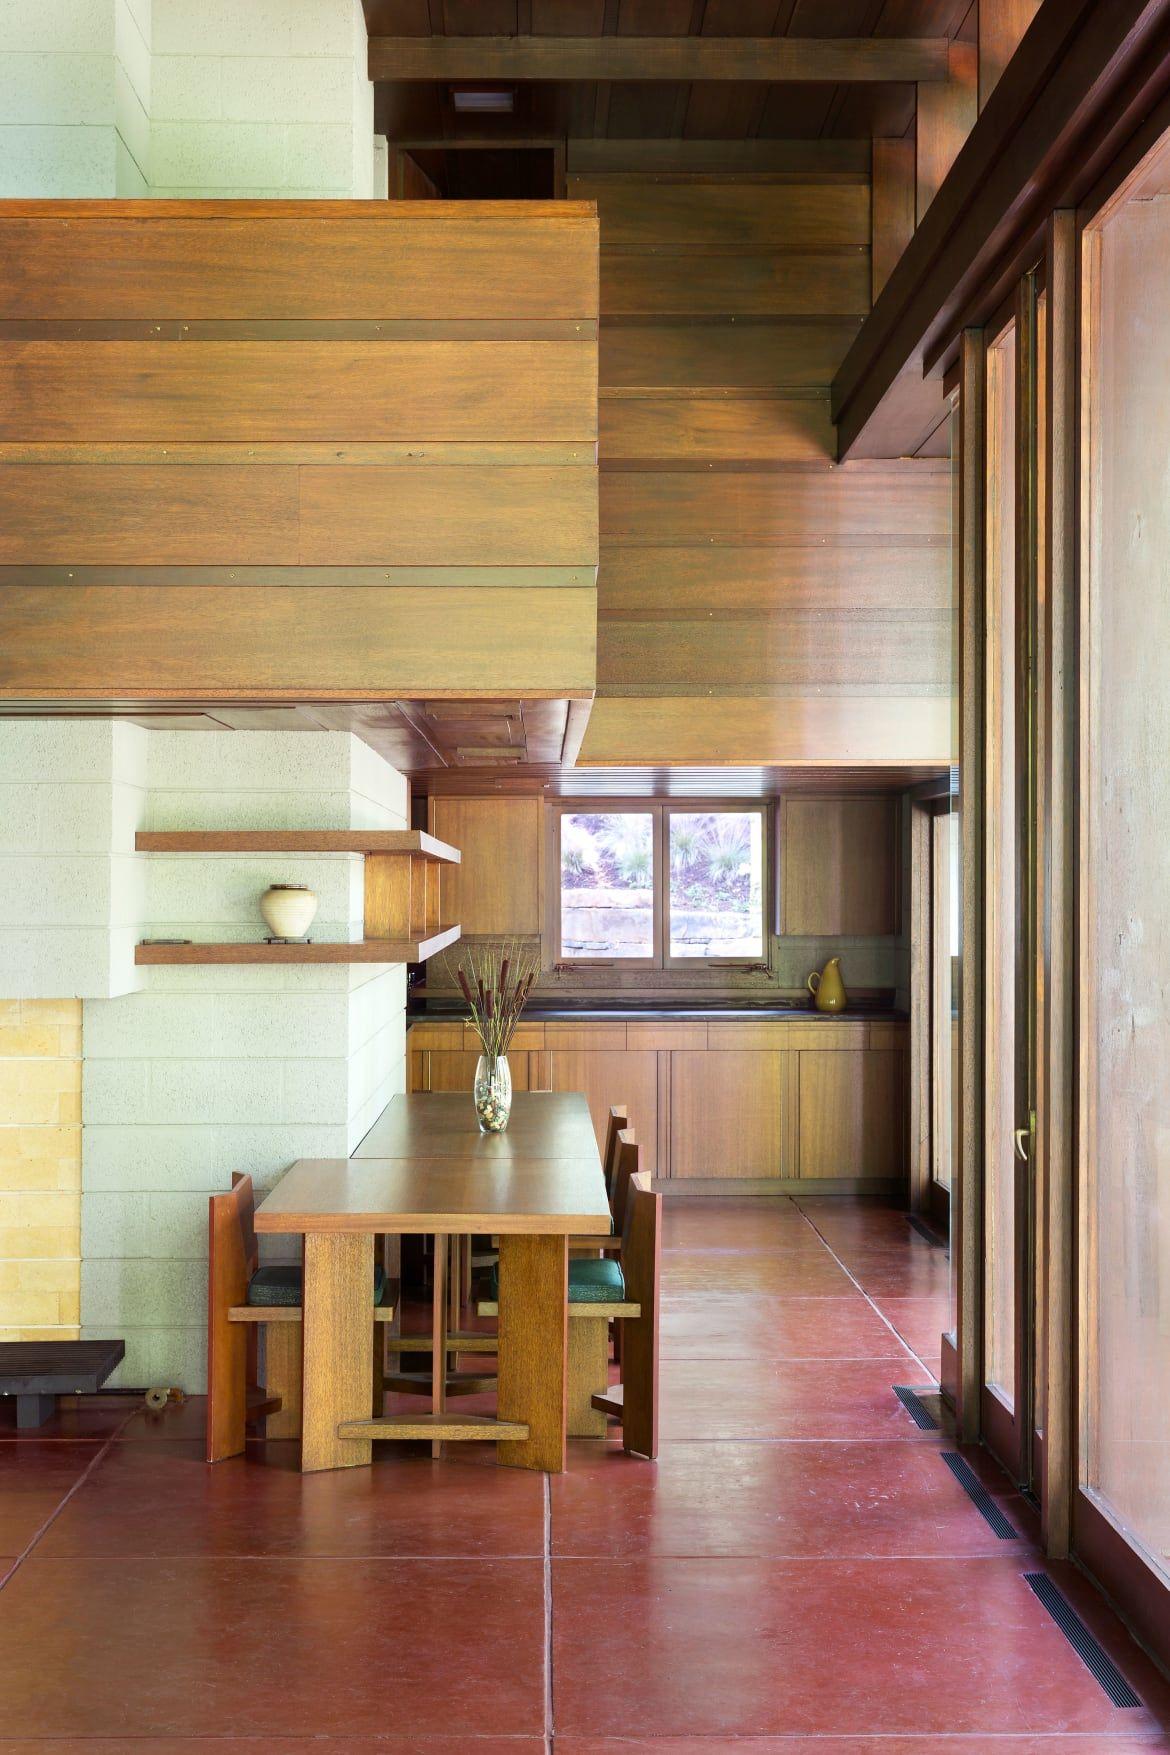 Frank Lloyd Wright. Bachman Wilson House. Usonian Style. 1954. Millstone  Borough